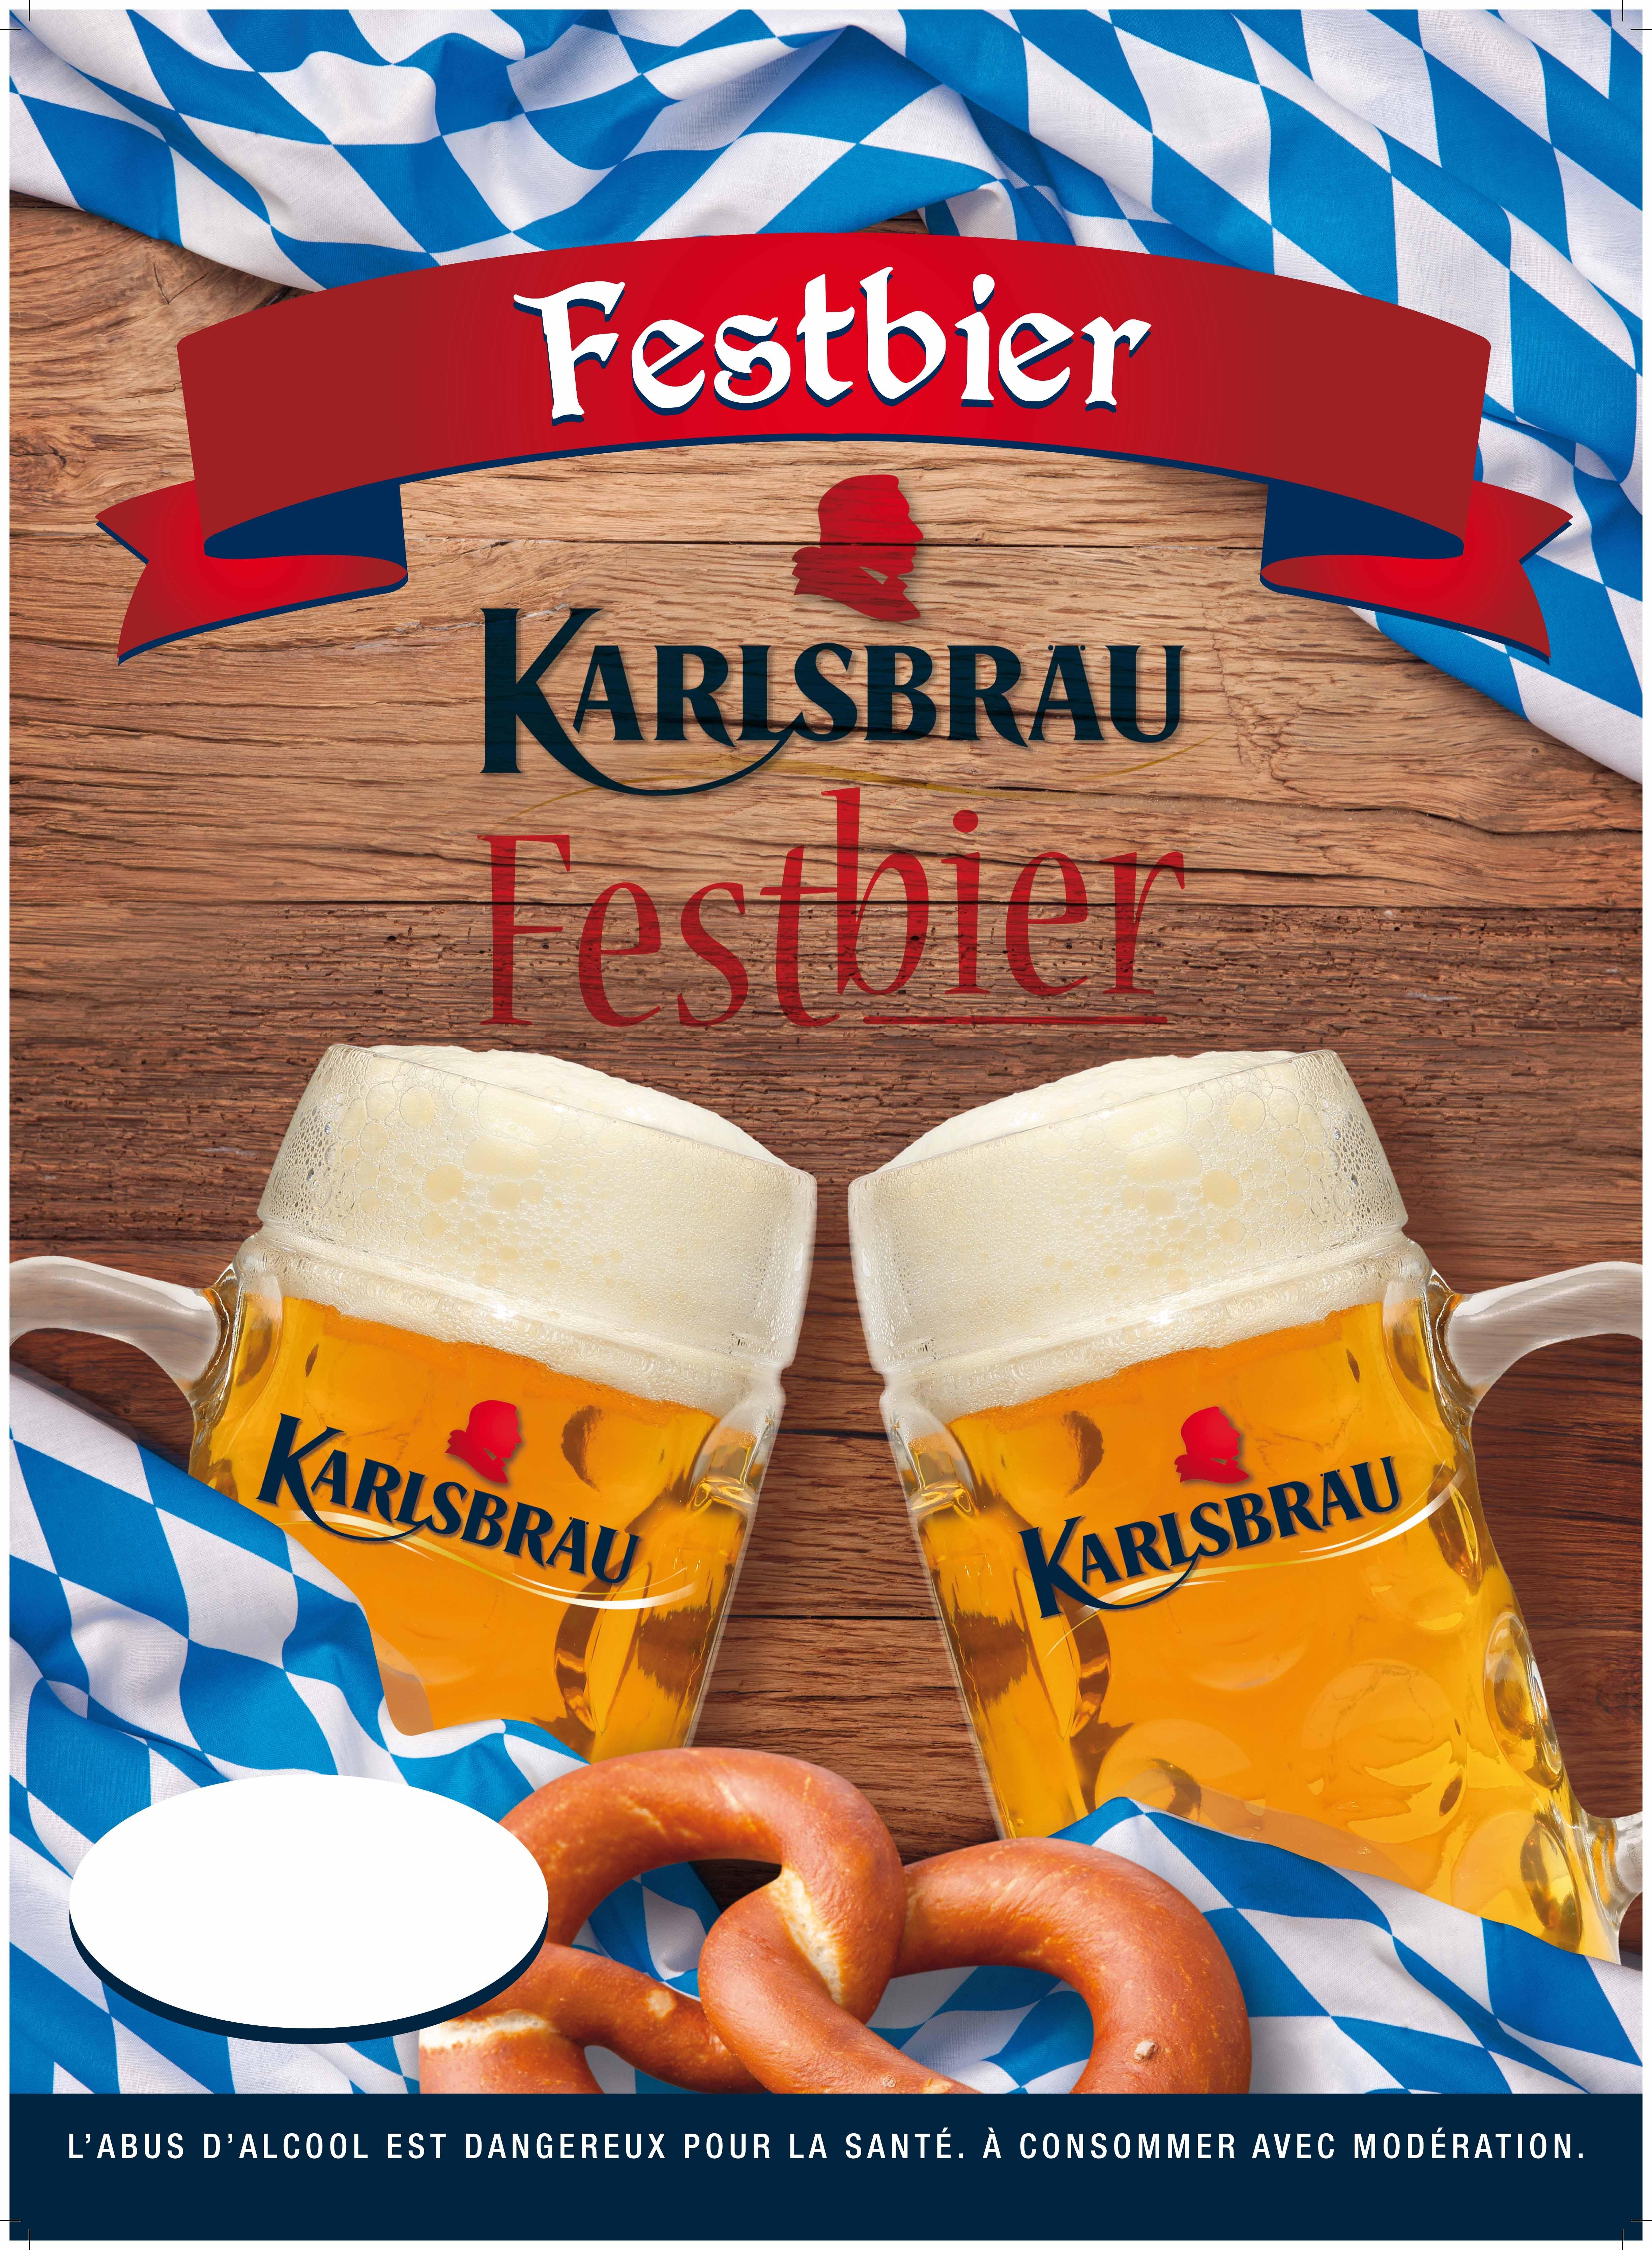 Karlsbrau Festbier